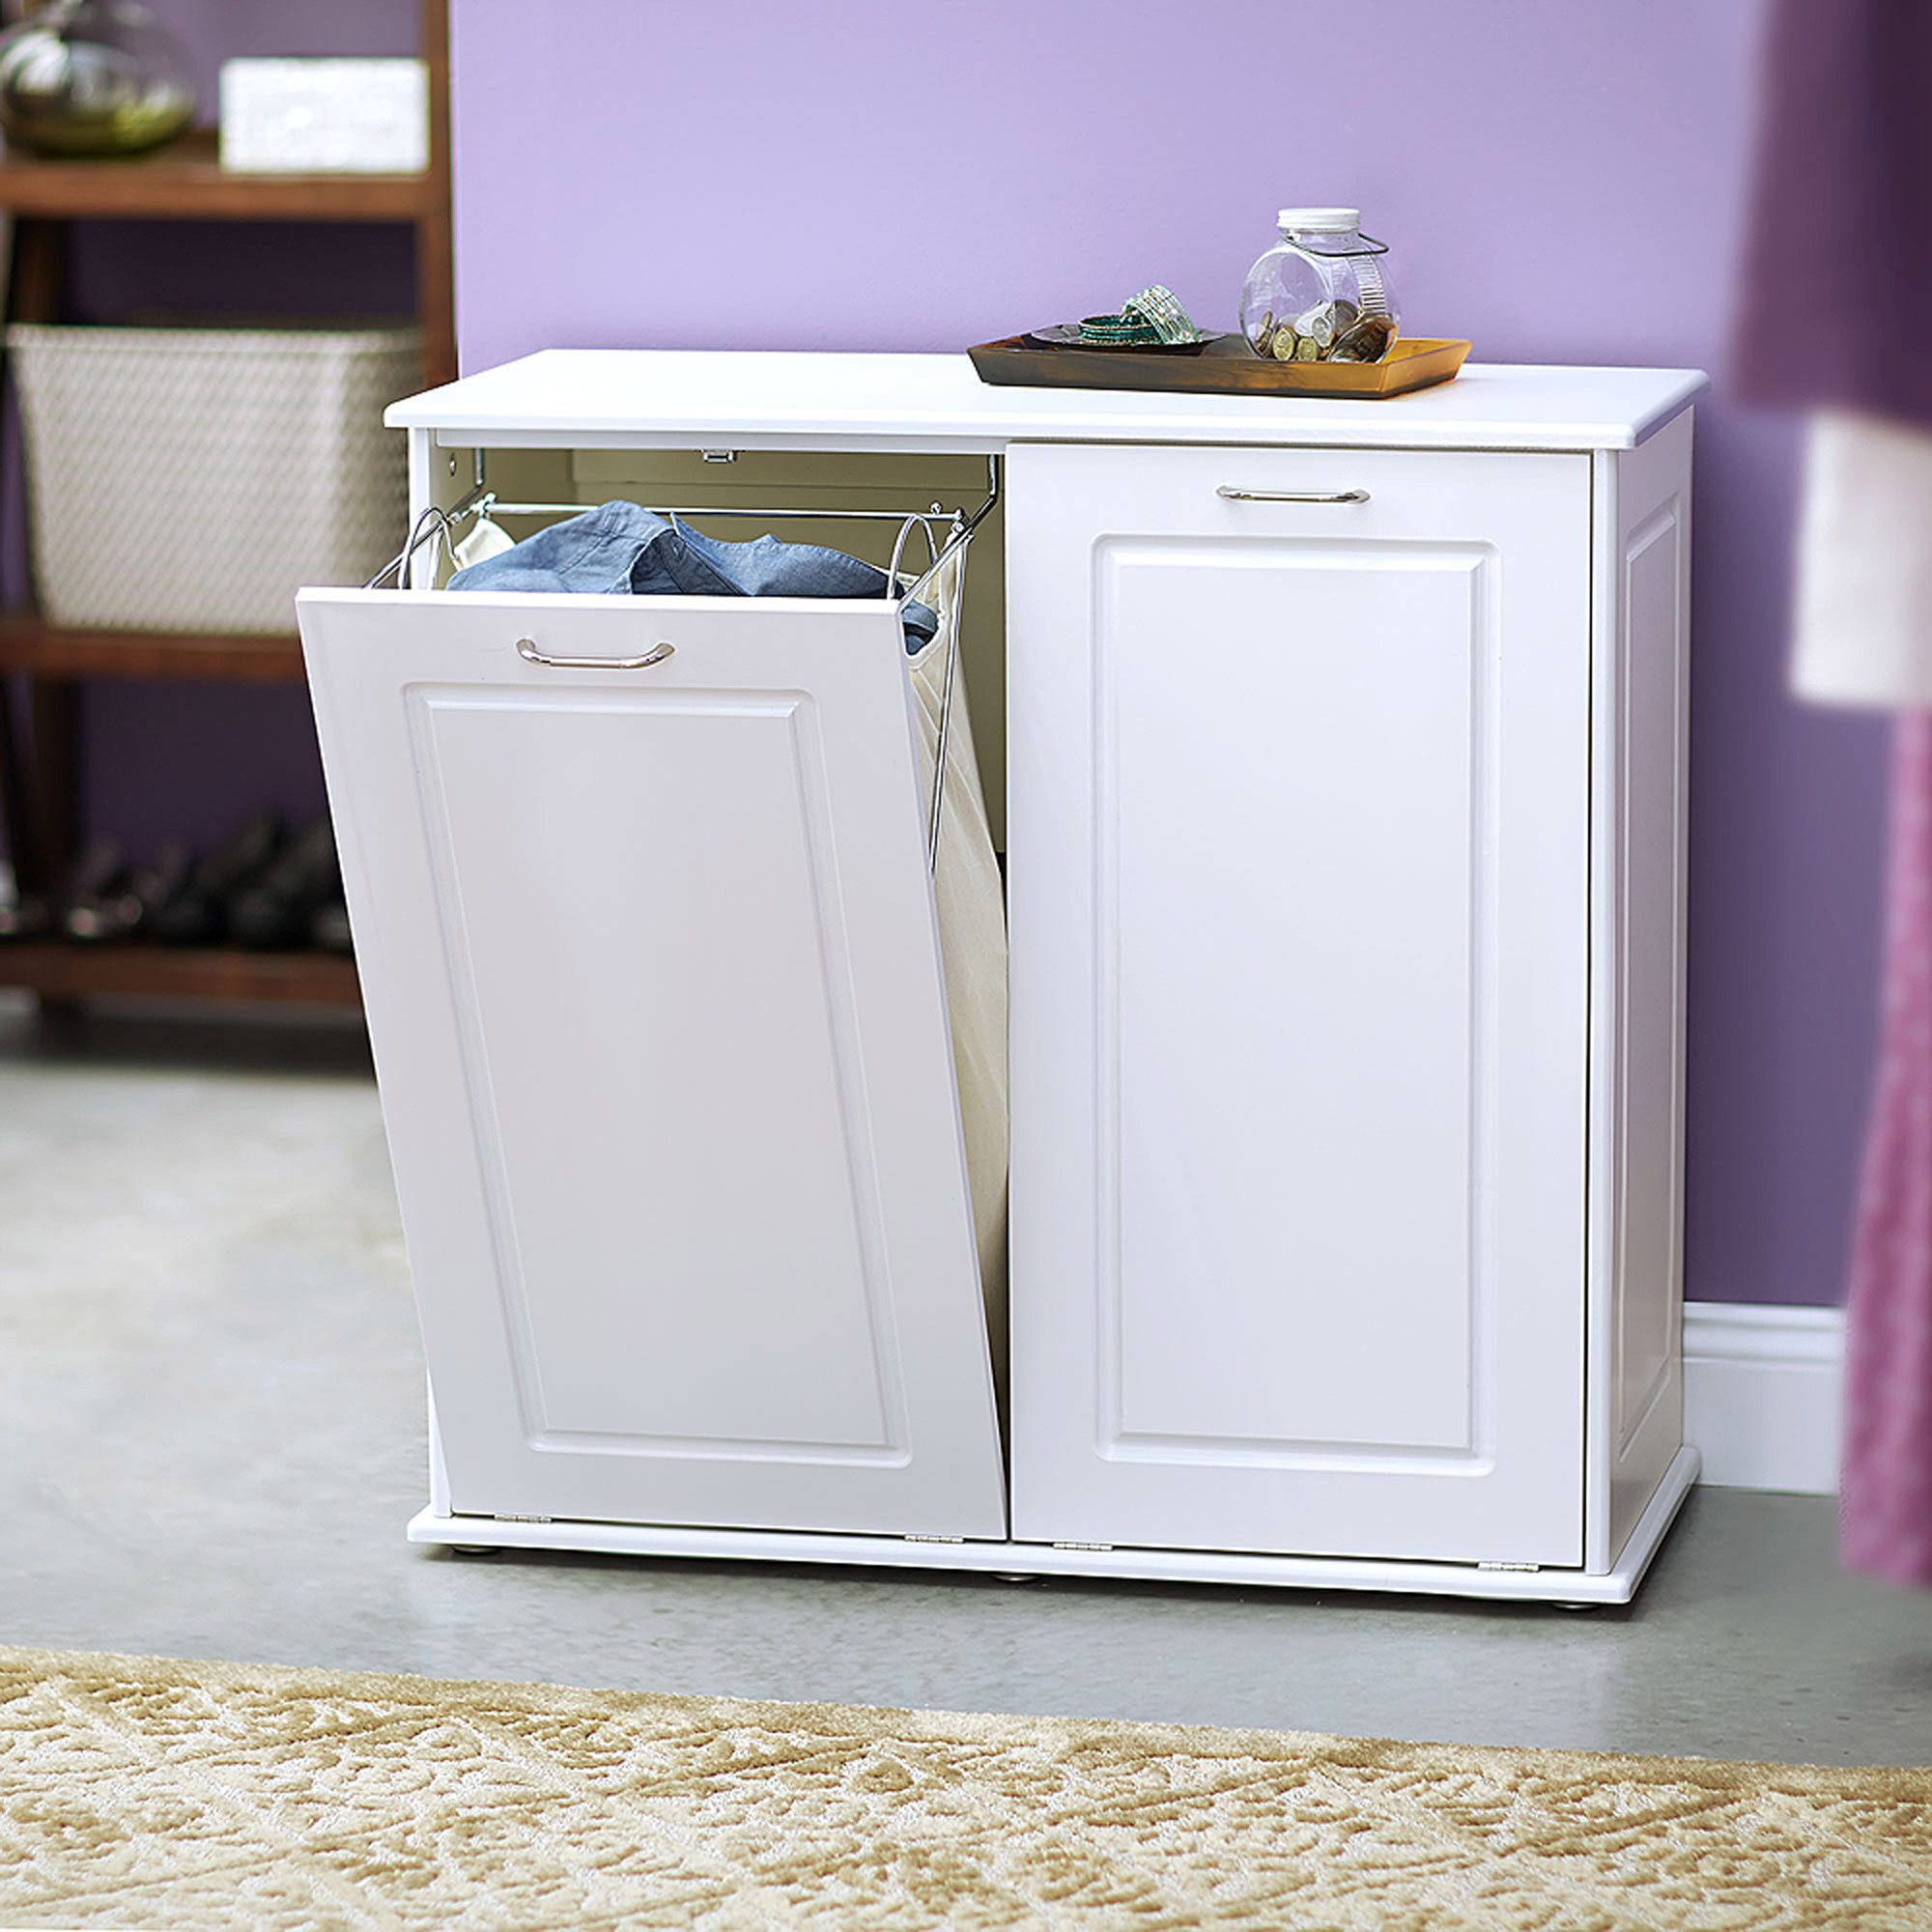 Charmant Household Essentials Tilt Out Laundry Sorter Cabinet, White   Walmart.com